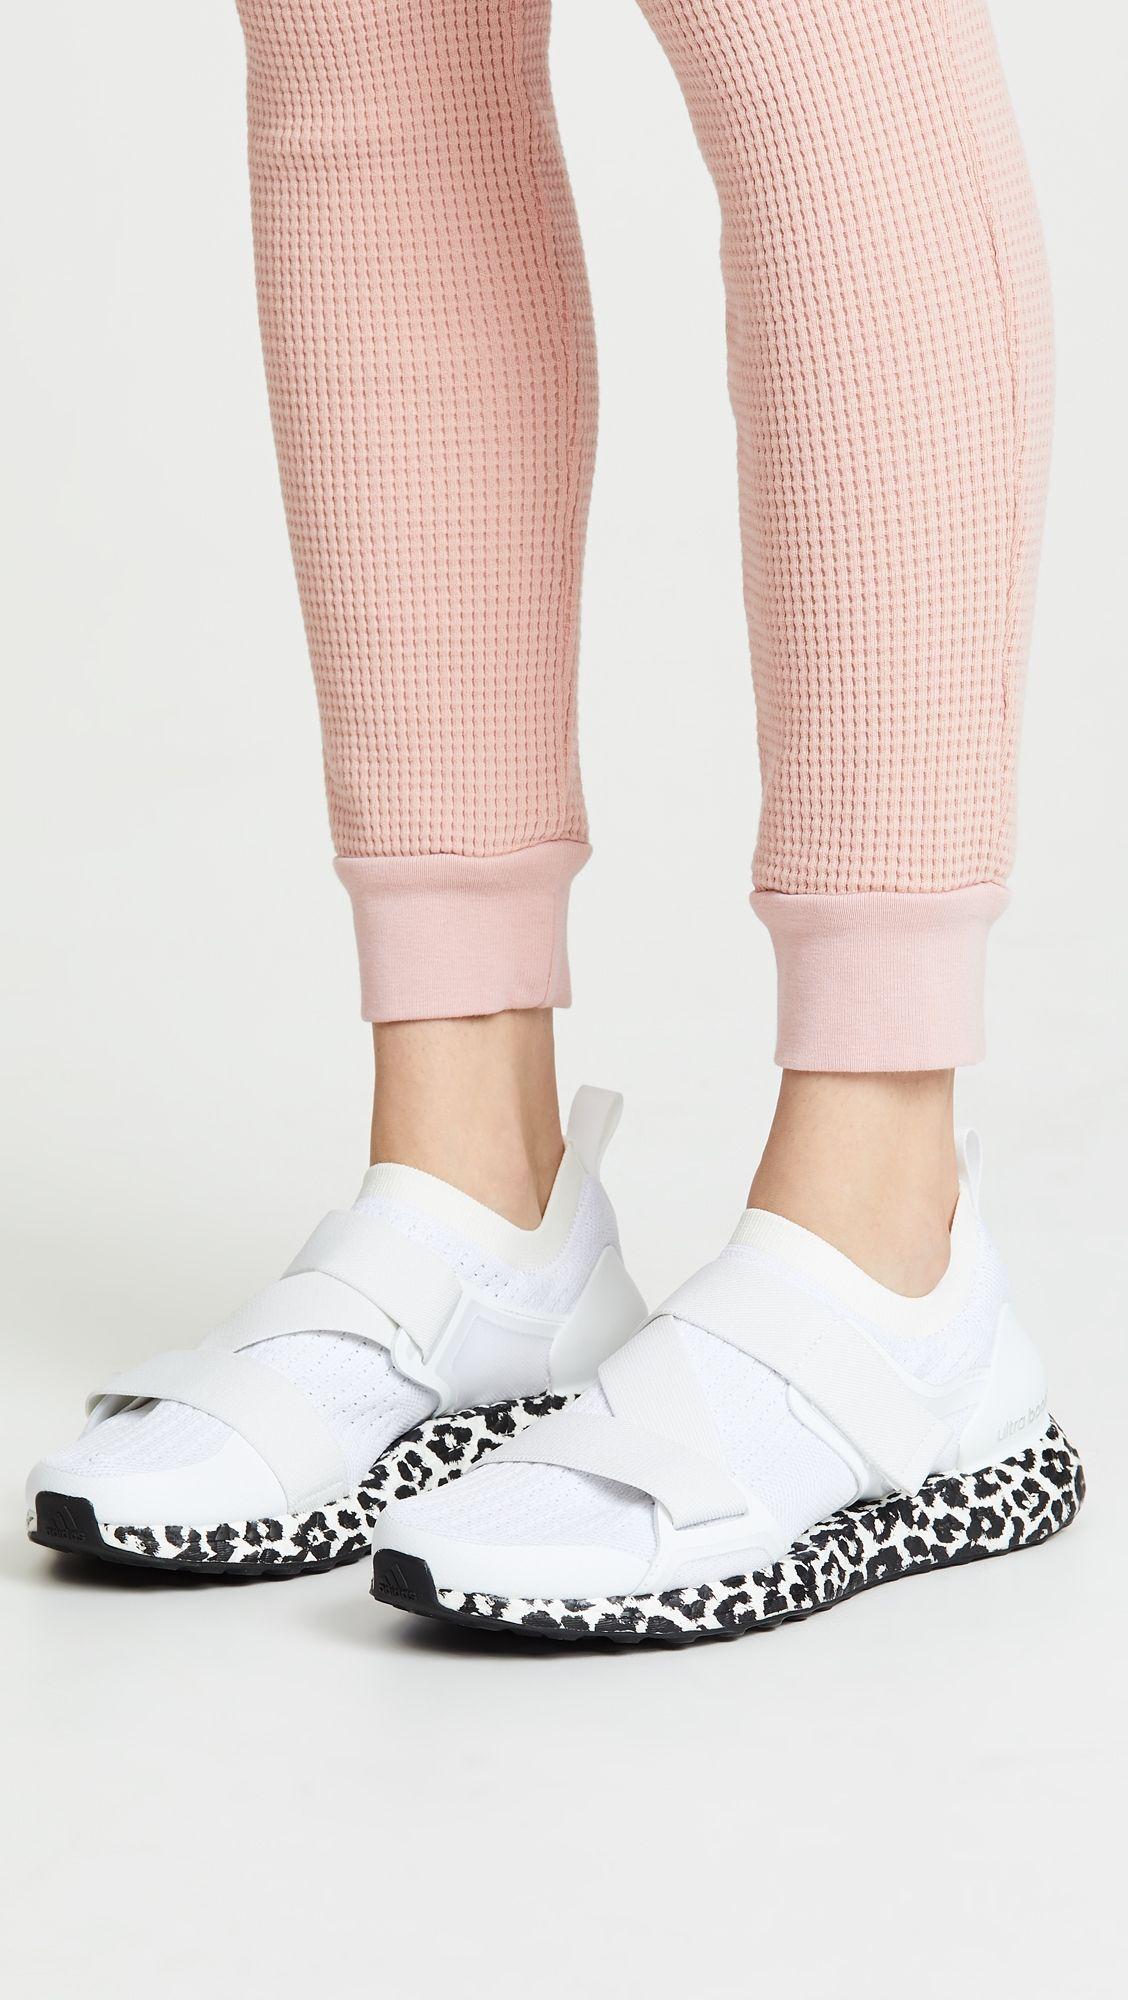 ca20b9f2f adidas by Stella McCartney UltraBOOST X Sneakers